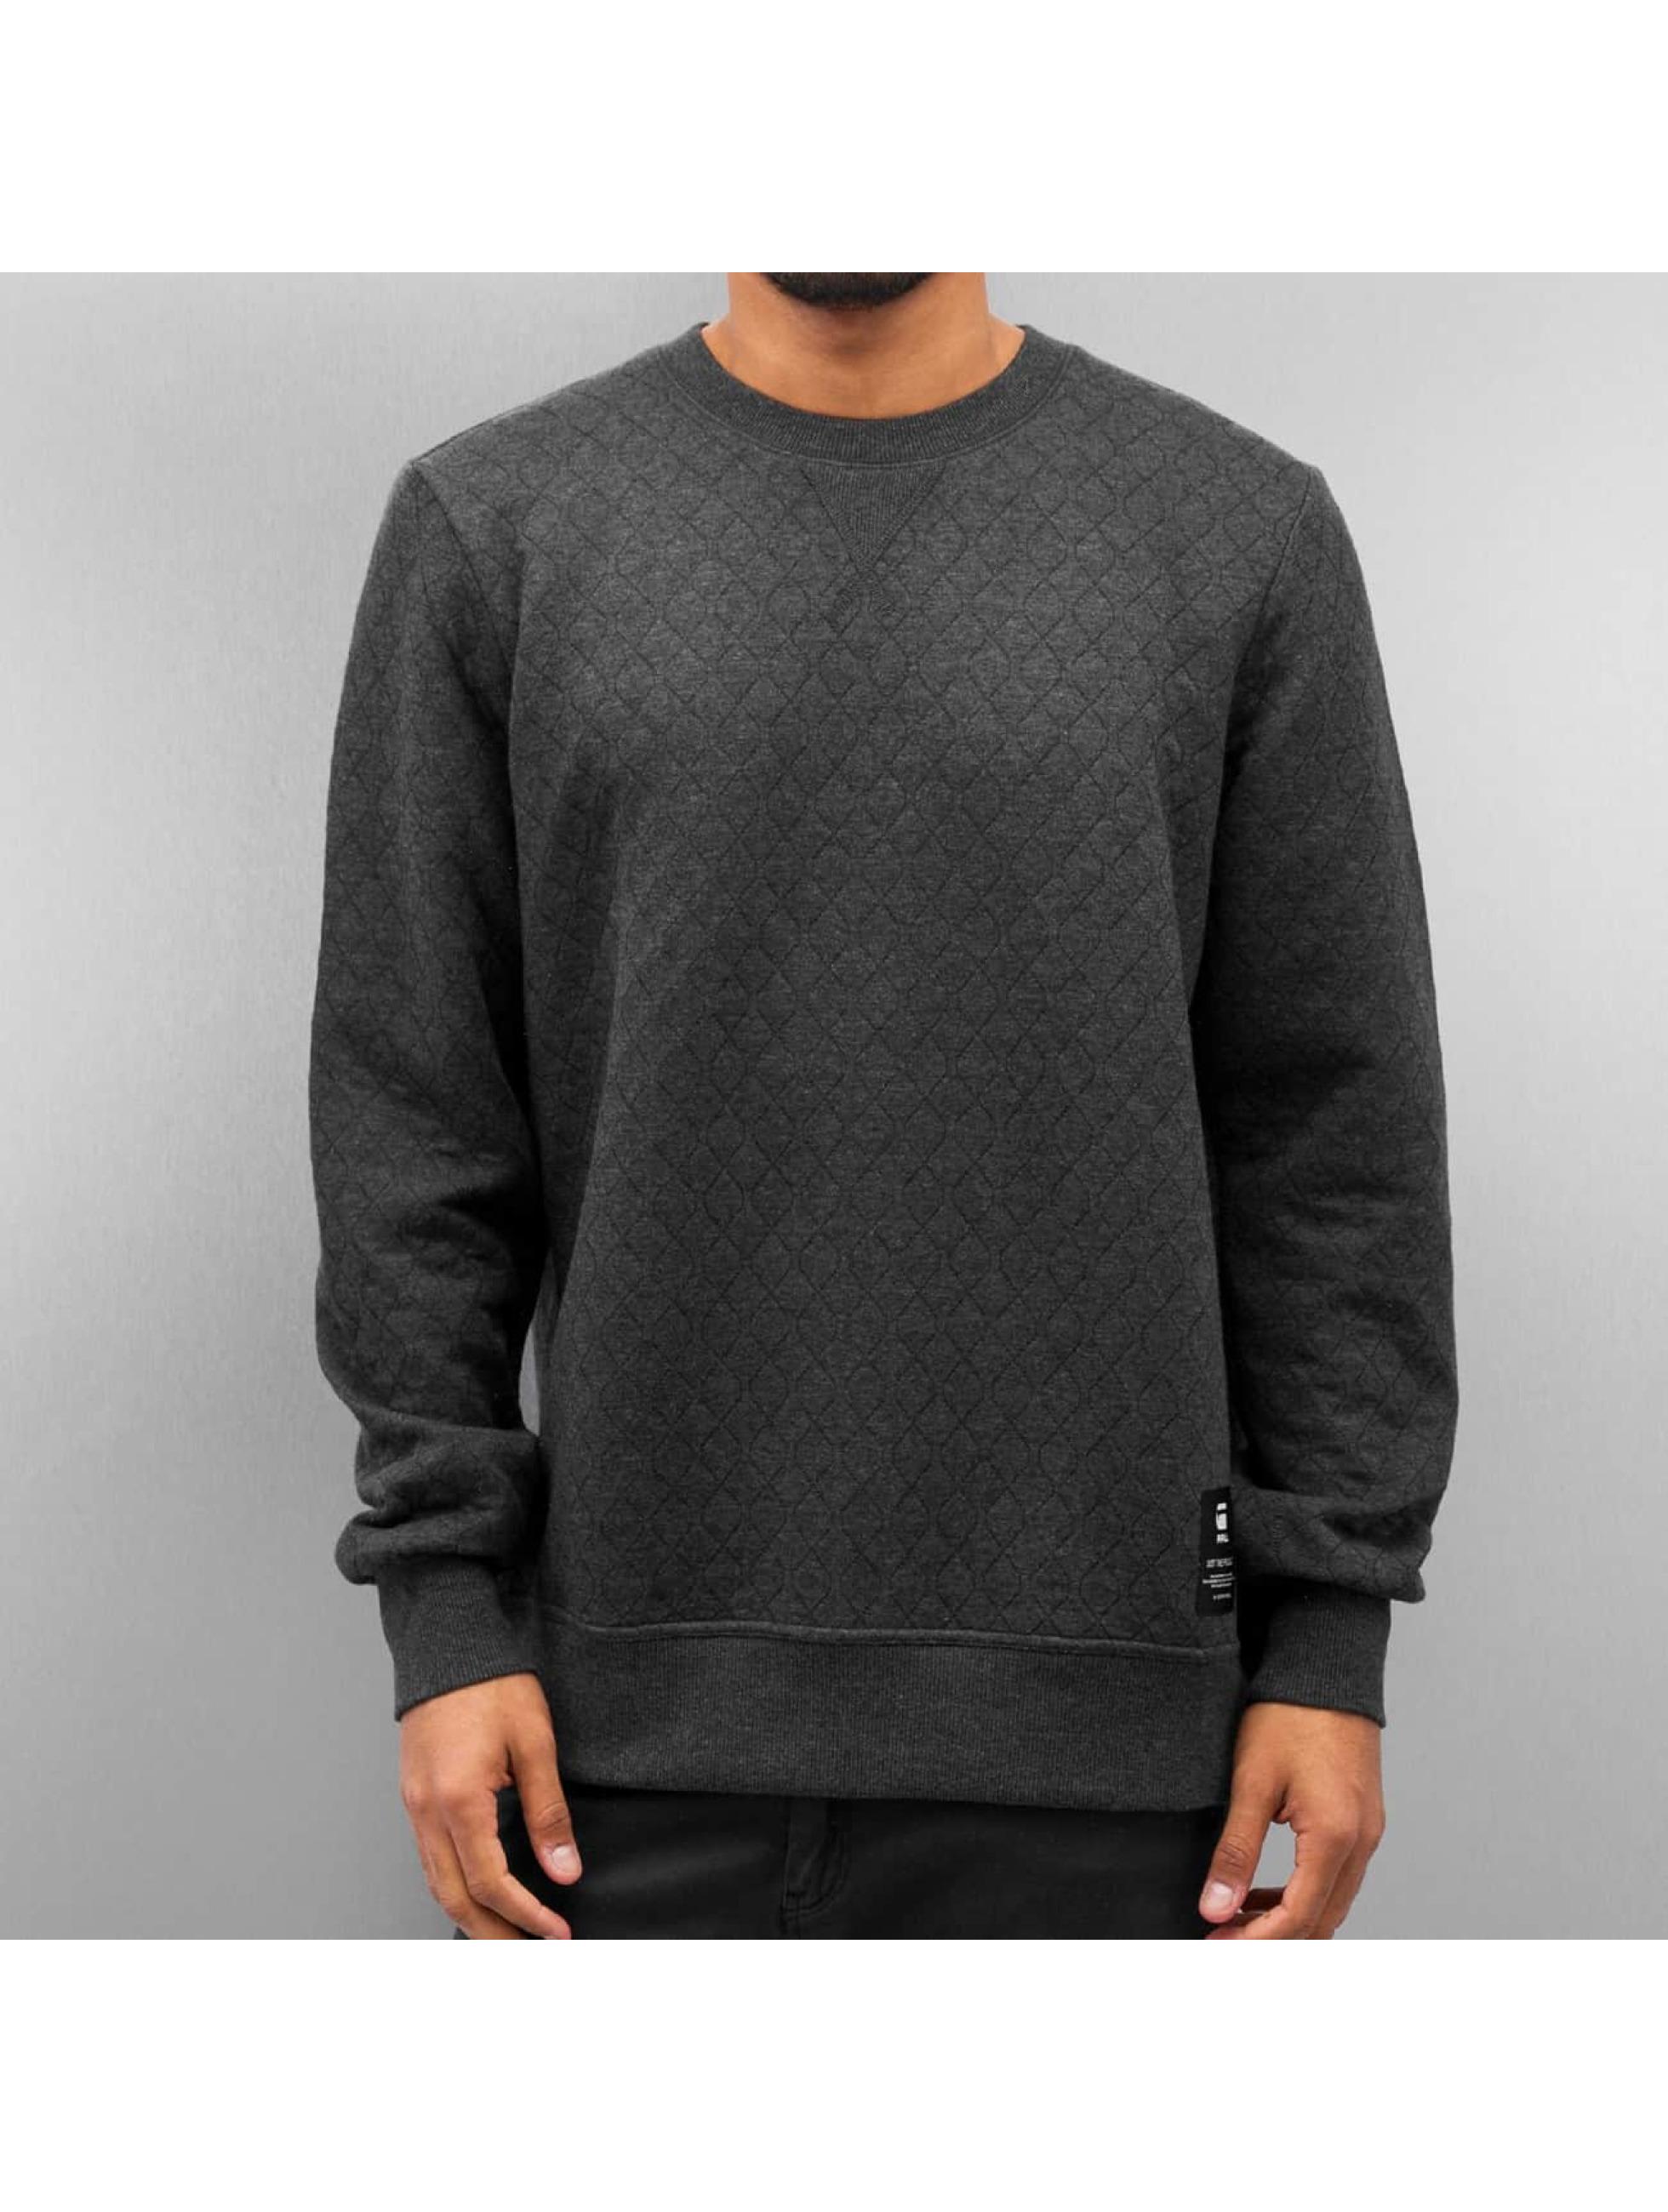 G-Star Пуловер Heldrex Utah Jacquard черный